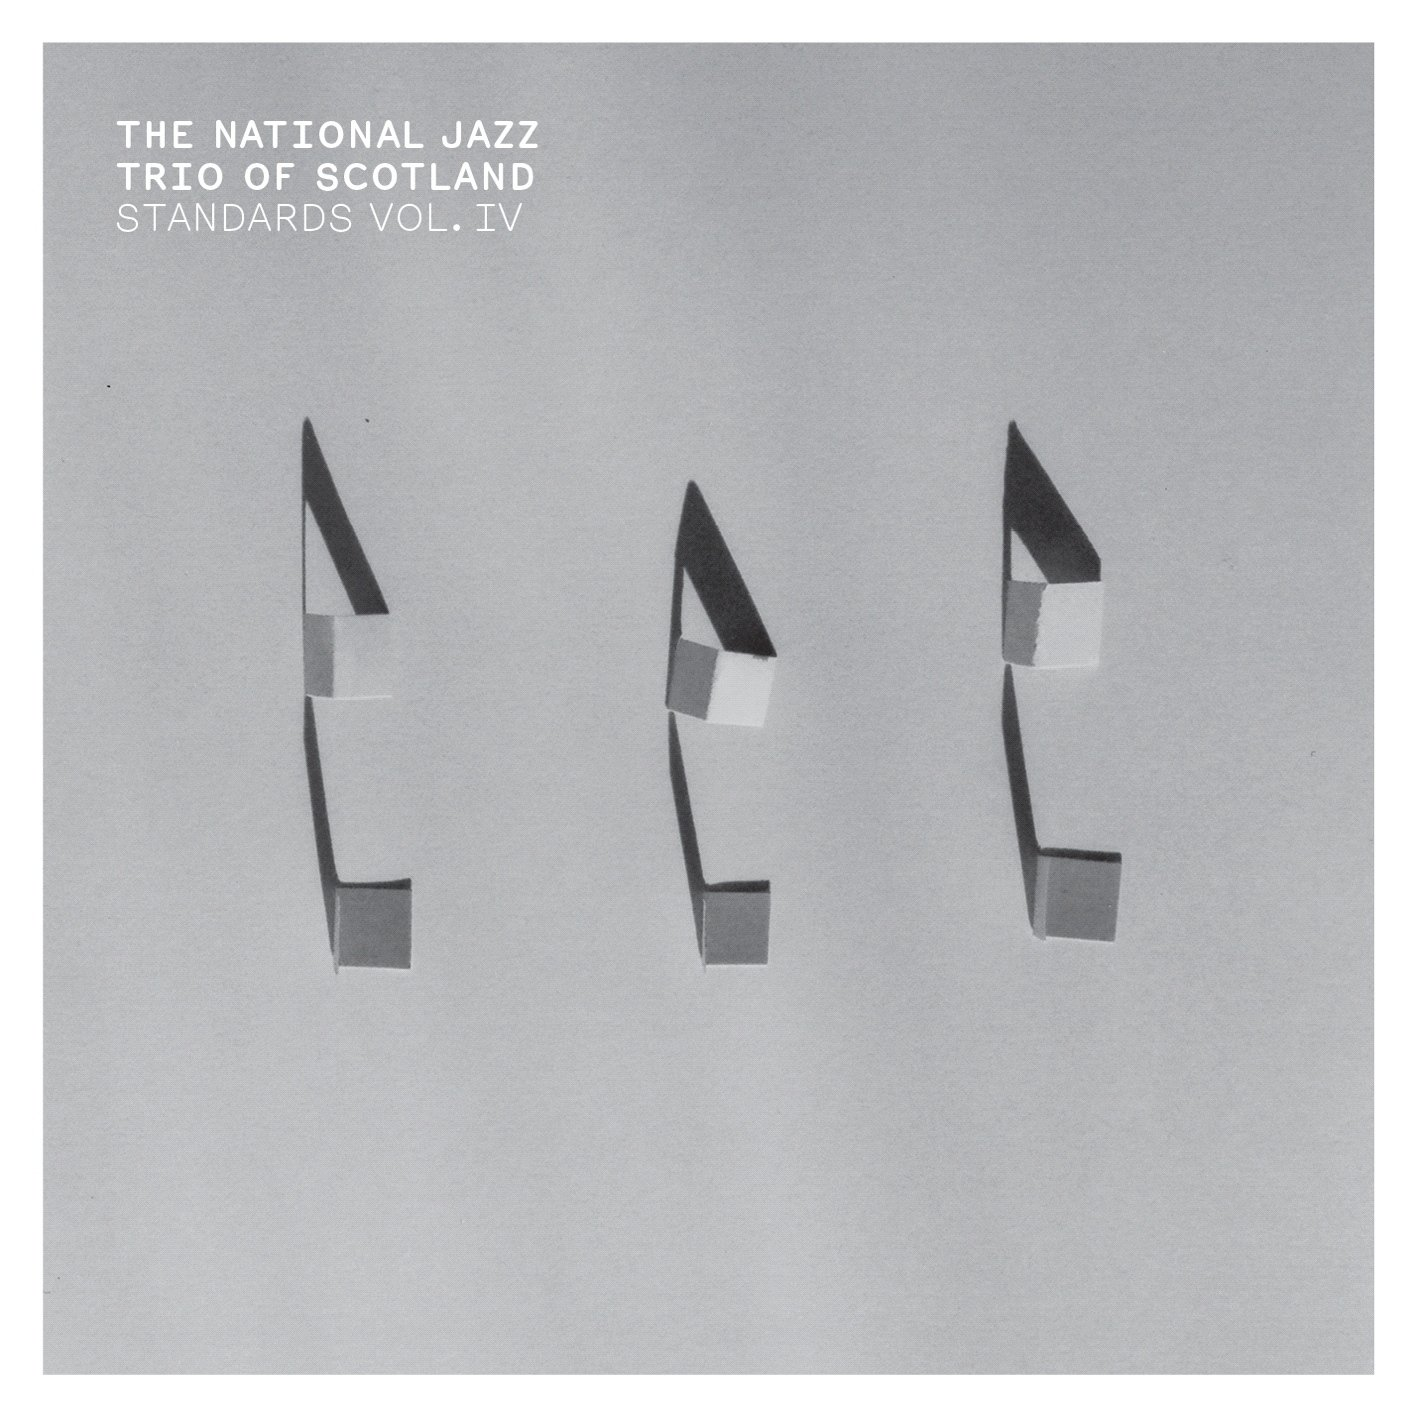 Vinilo : National Jazz Trio of Scotland - Standards Vol. Iv (LP Vinyl)